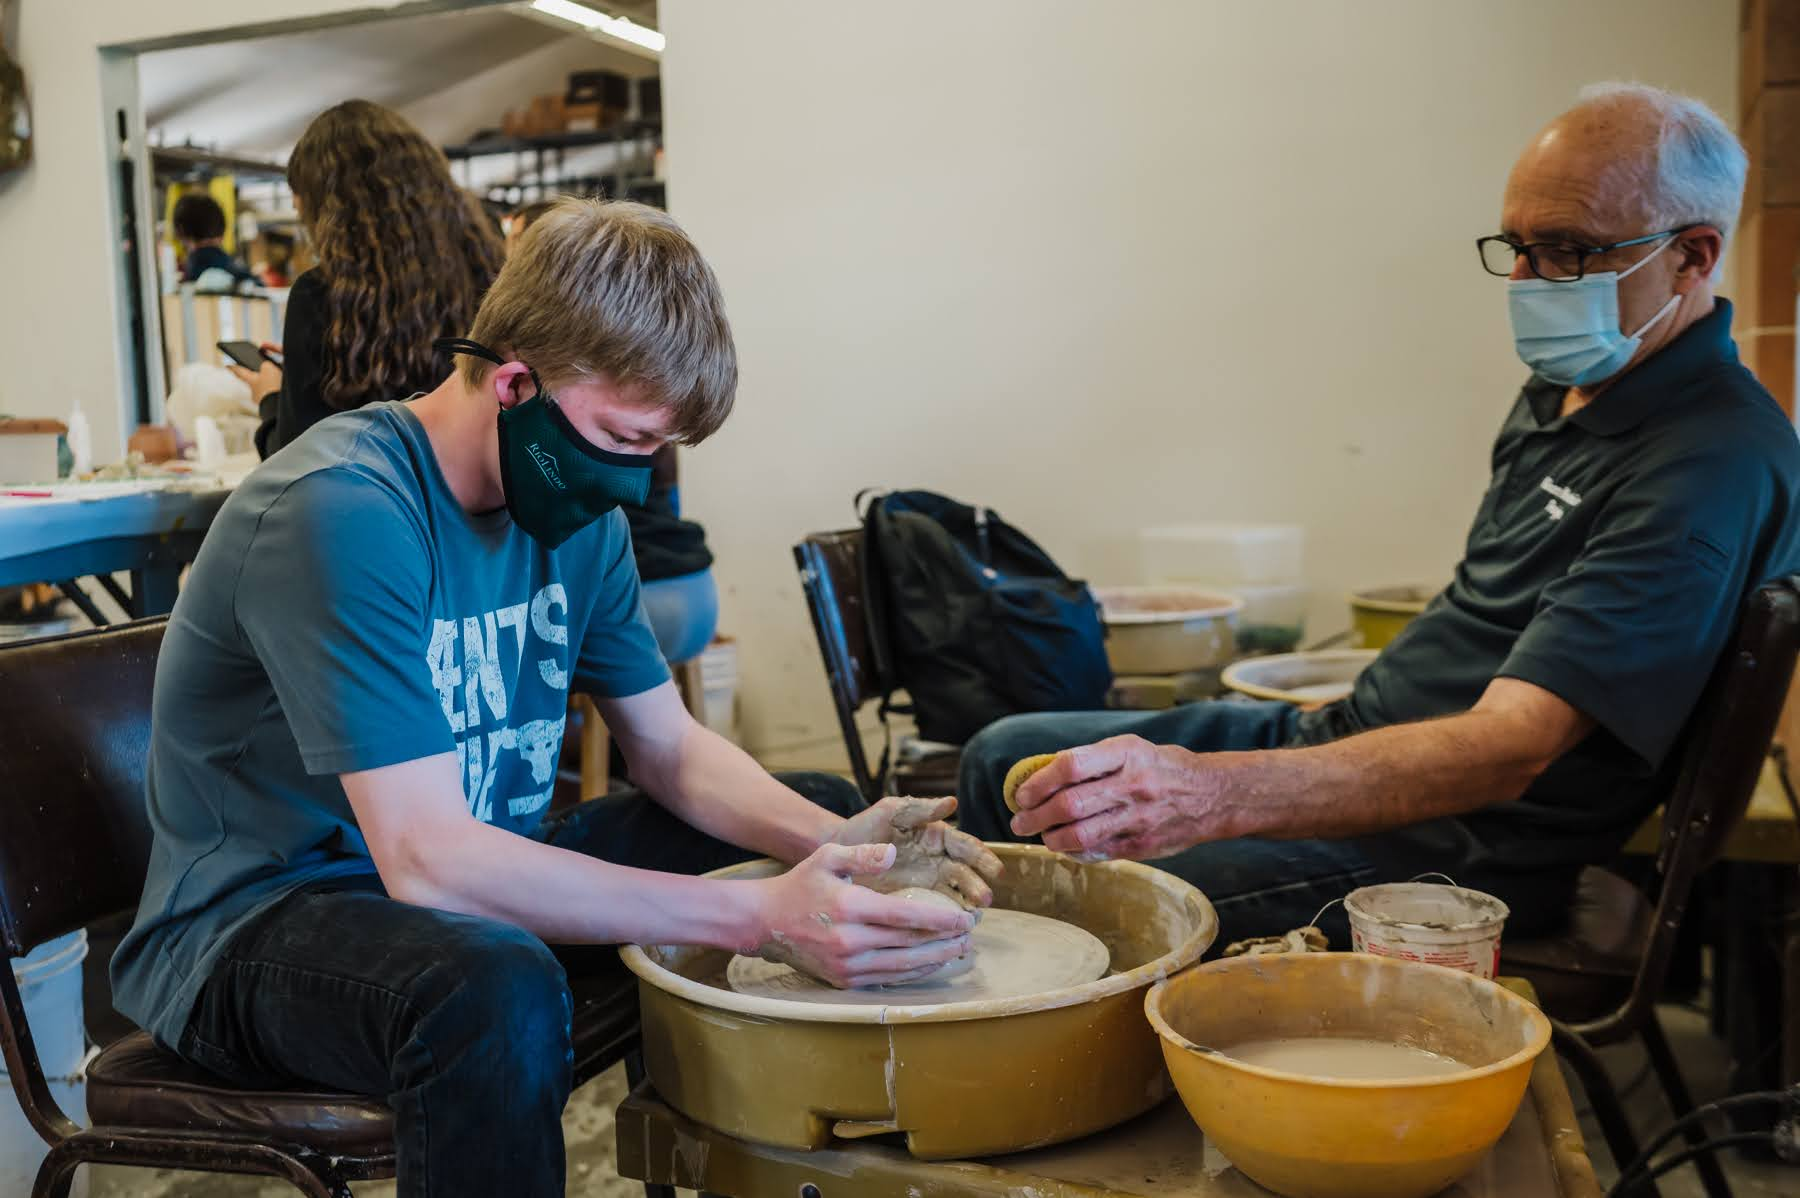 student creates ceramics on pottery wheel